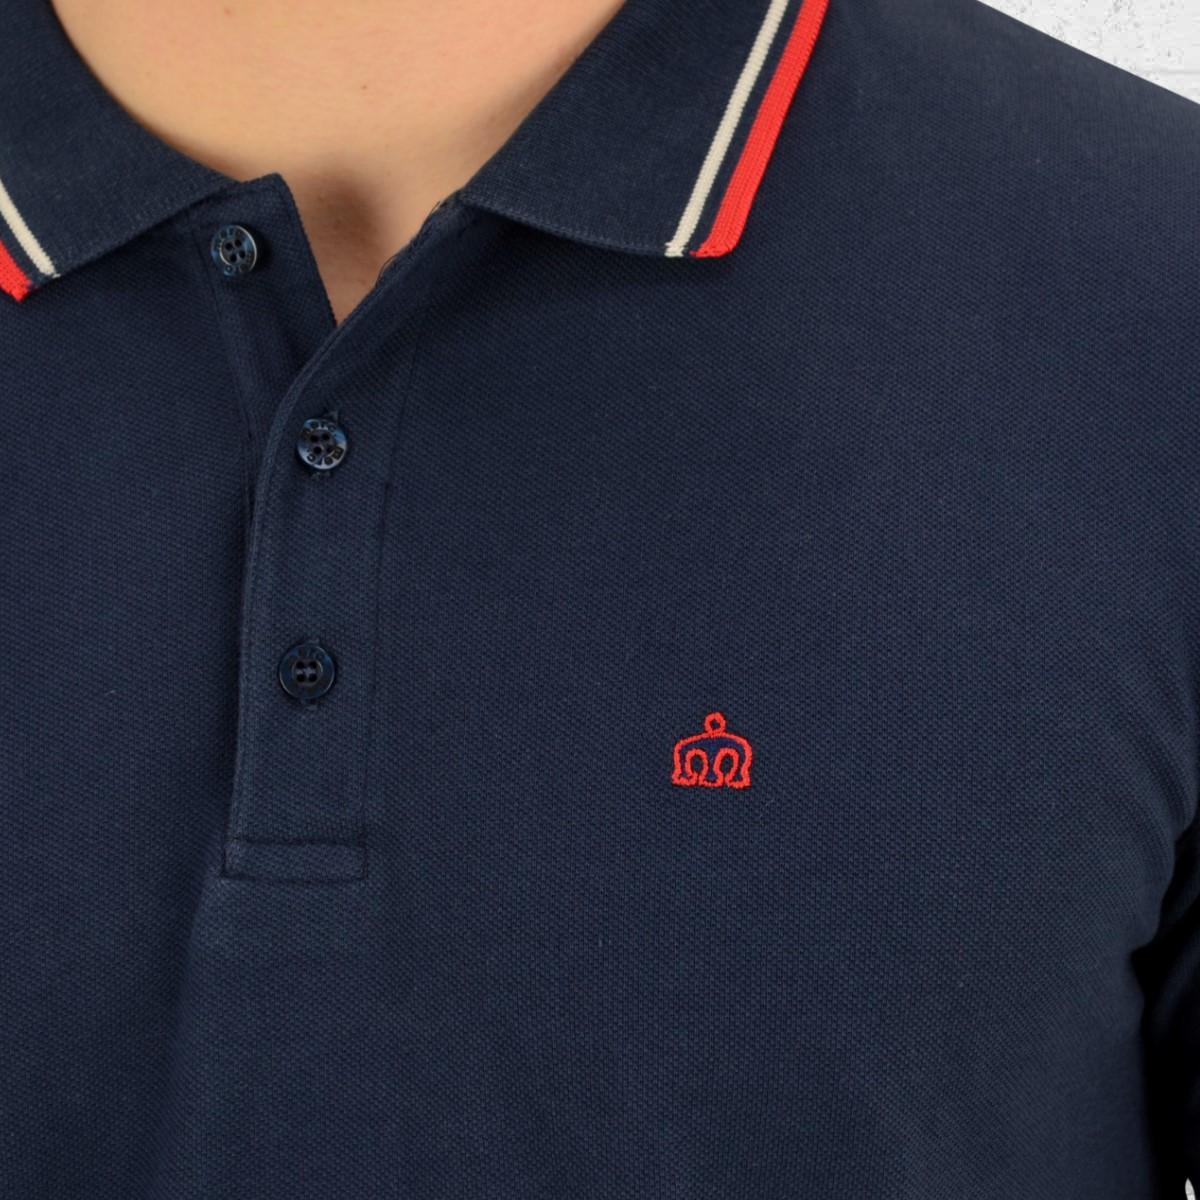 50% off rot weiß blau polo shirt b30eb 7de00